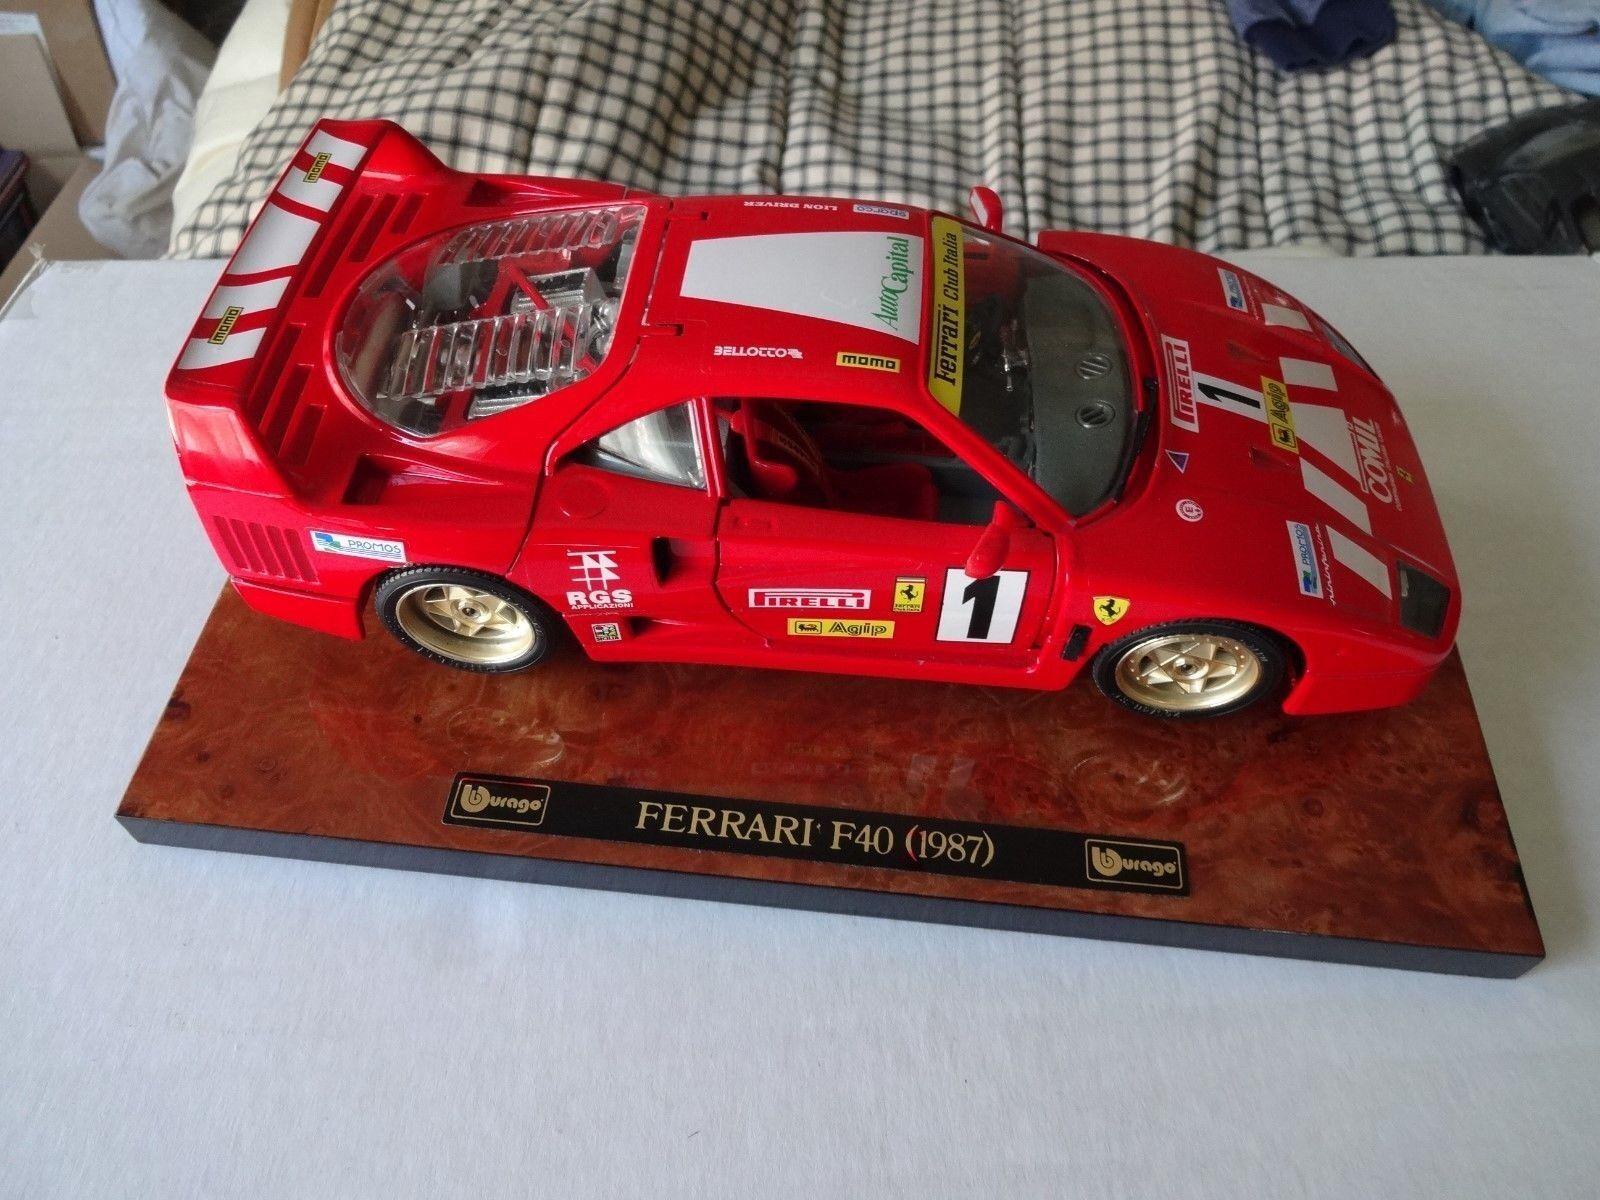 Bburago Burago 1 18 Ferrari F40 racer excecutive edition excellent